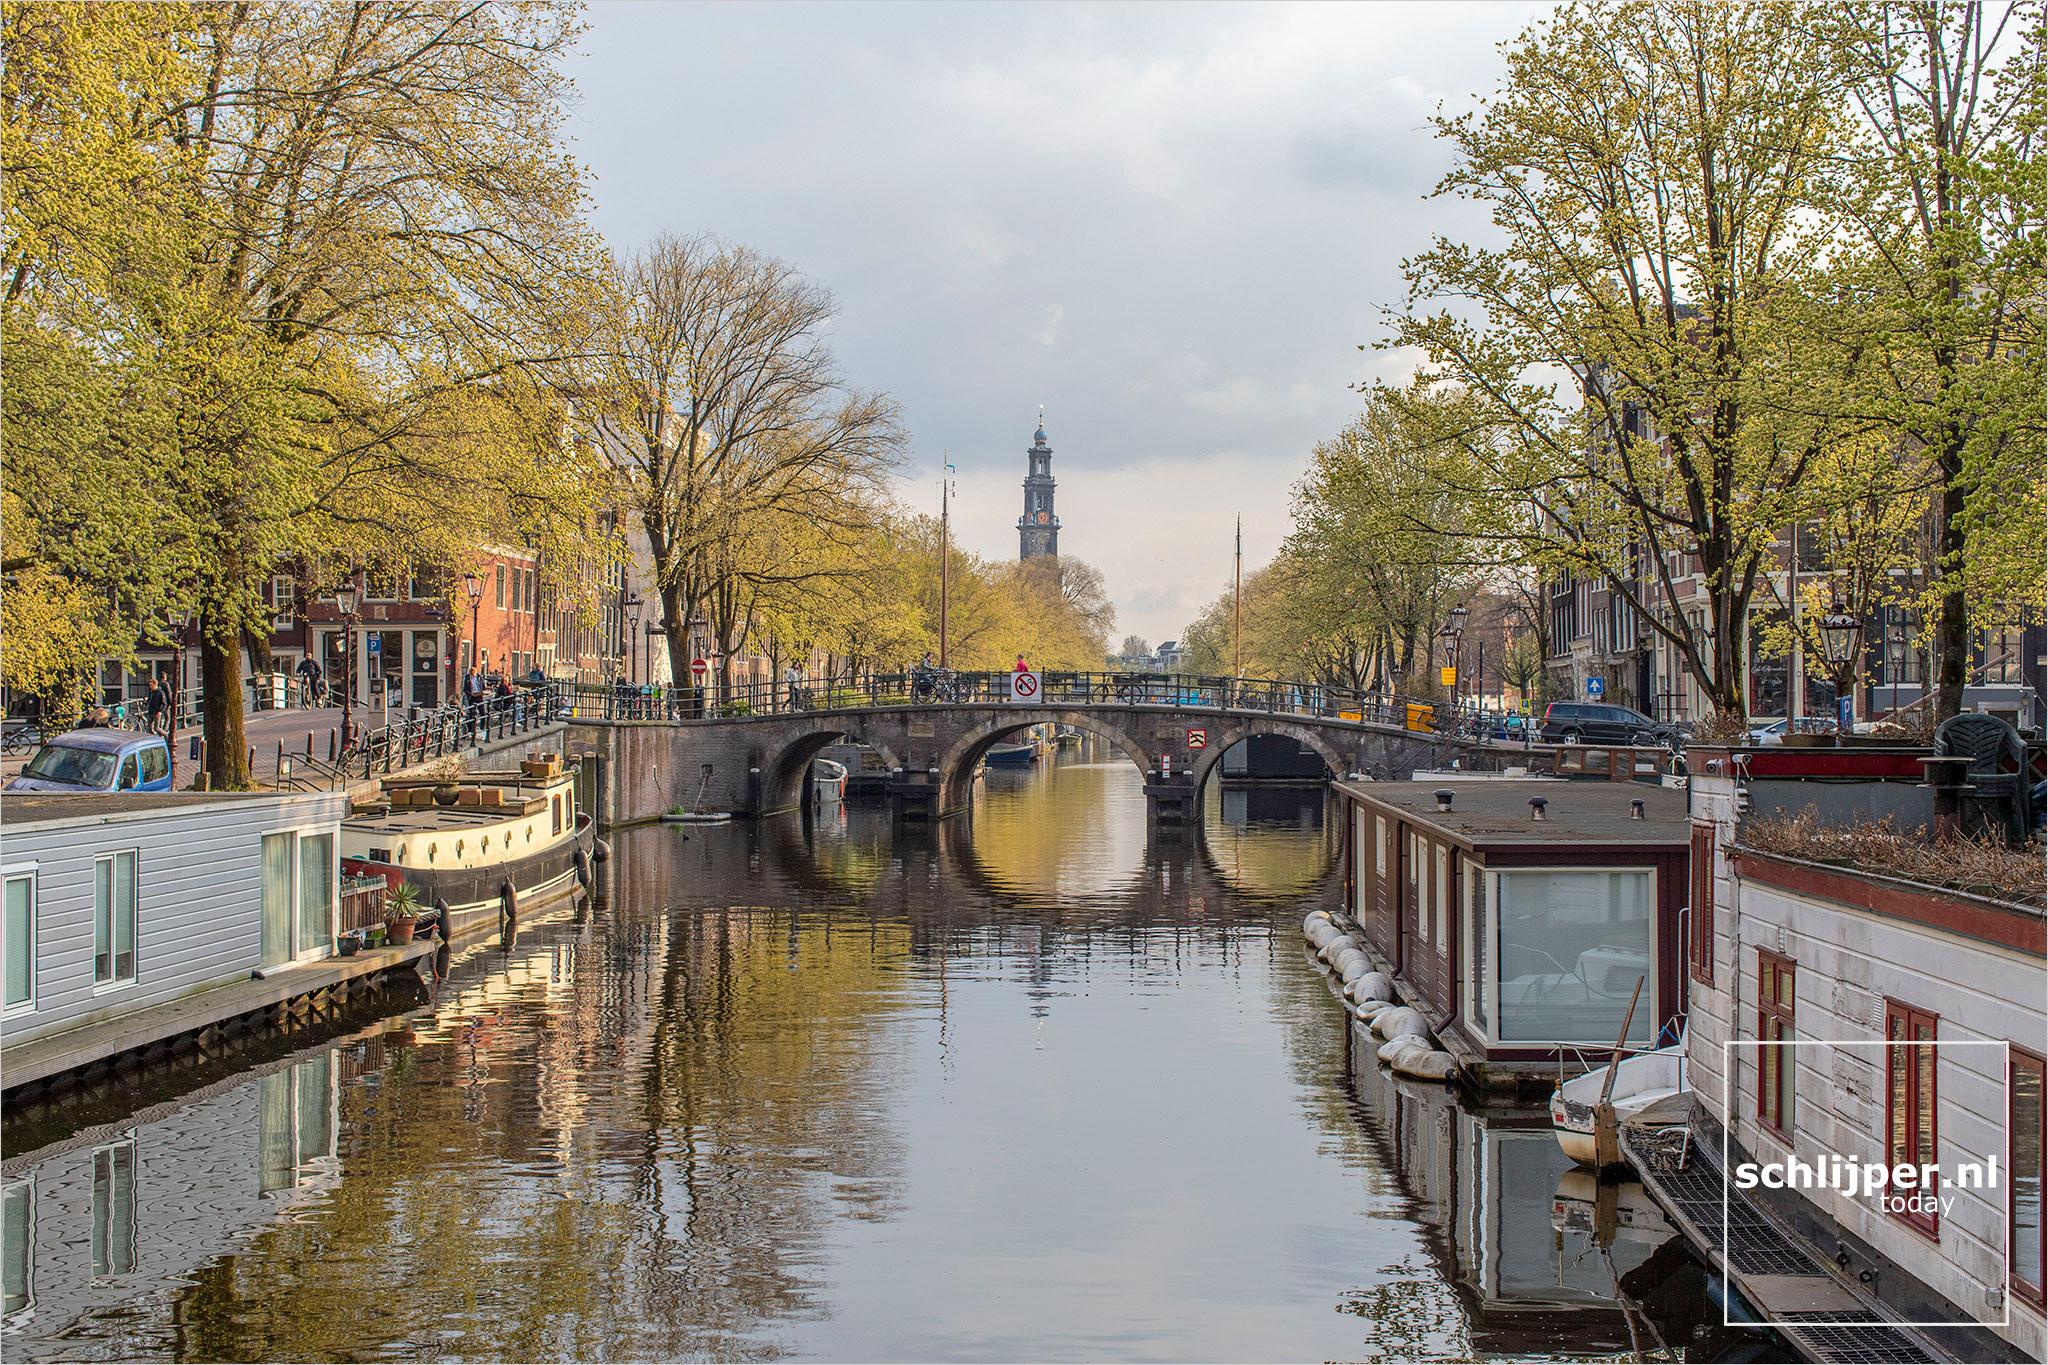 The Netherlands, Amsterdam, 19 april 2021